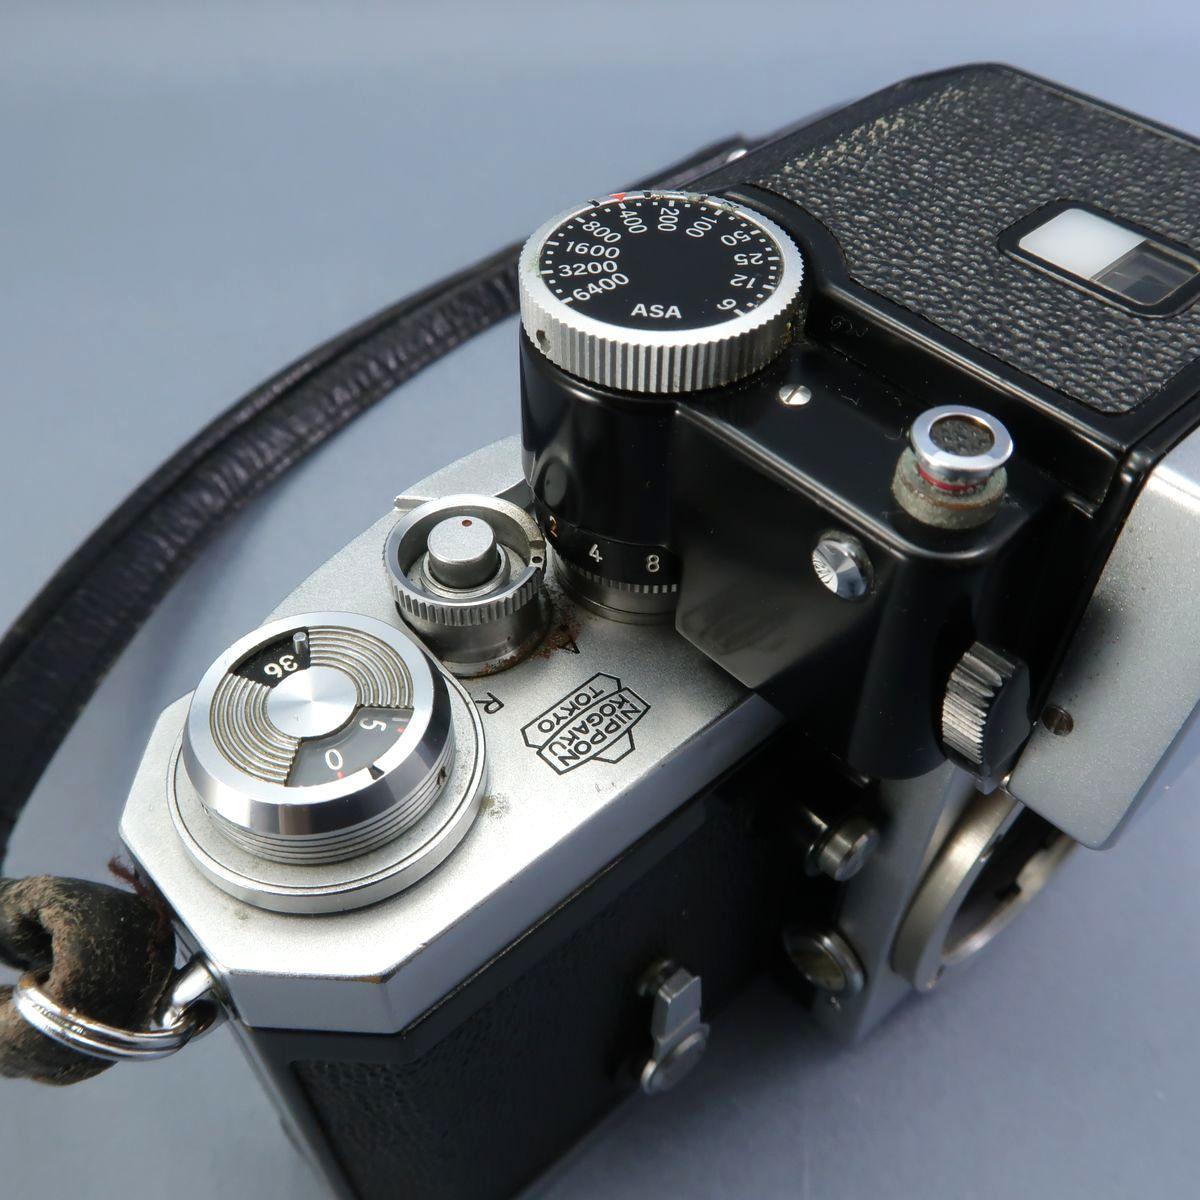 ★Nikon F フィルムカメラ 本体 レンズ Nikkor-Auto 105mm F 2.5 28mm F 3.5 NIKKOR-H Auto 1:3.5 f=2.8cm FTN 付属多数 ジャンク_画像4